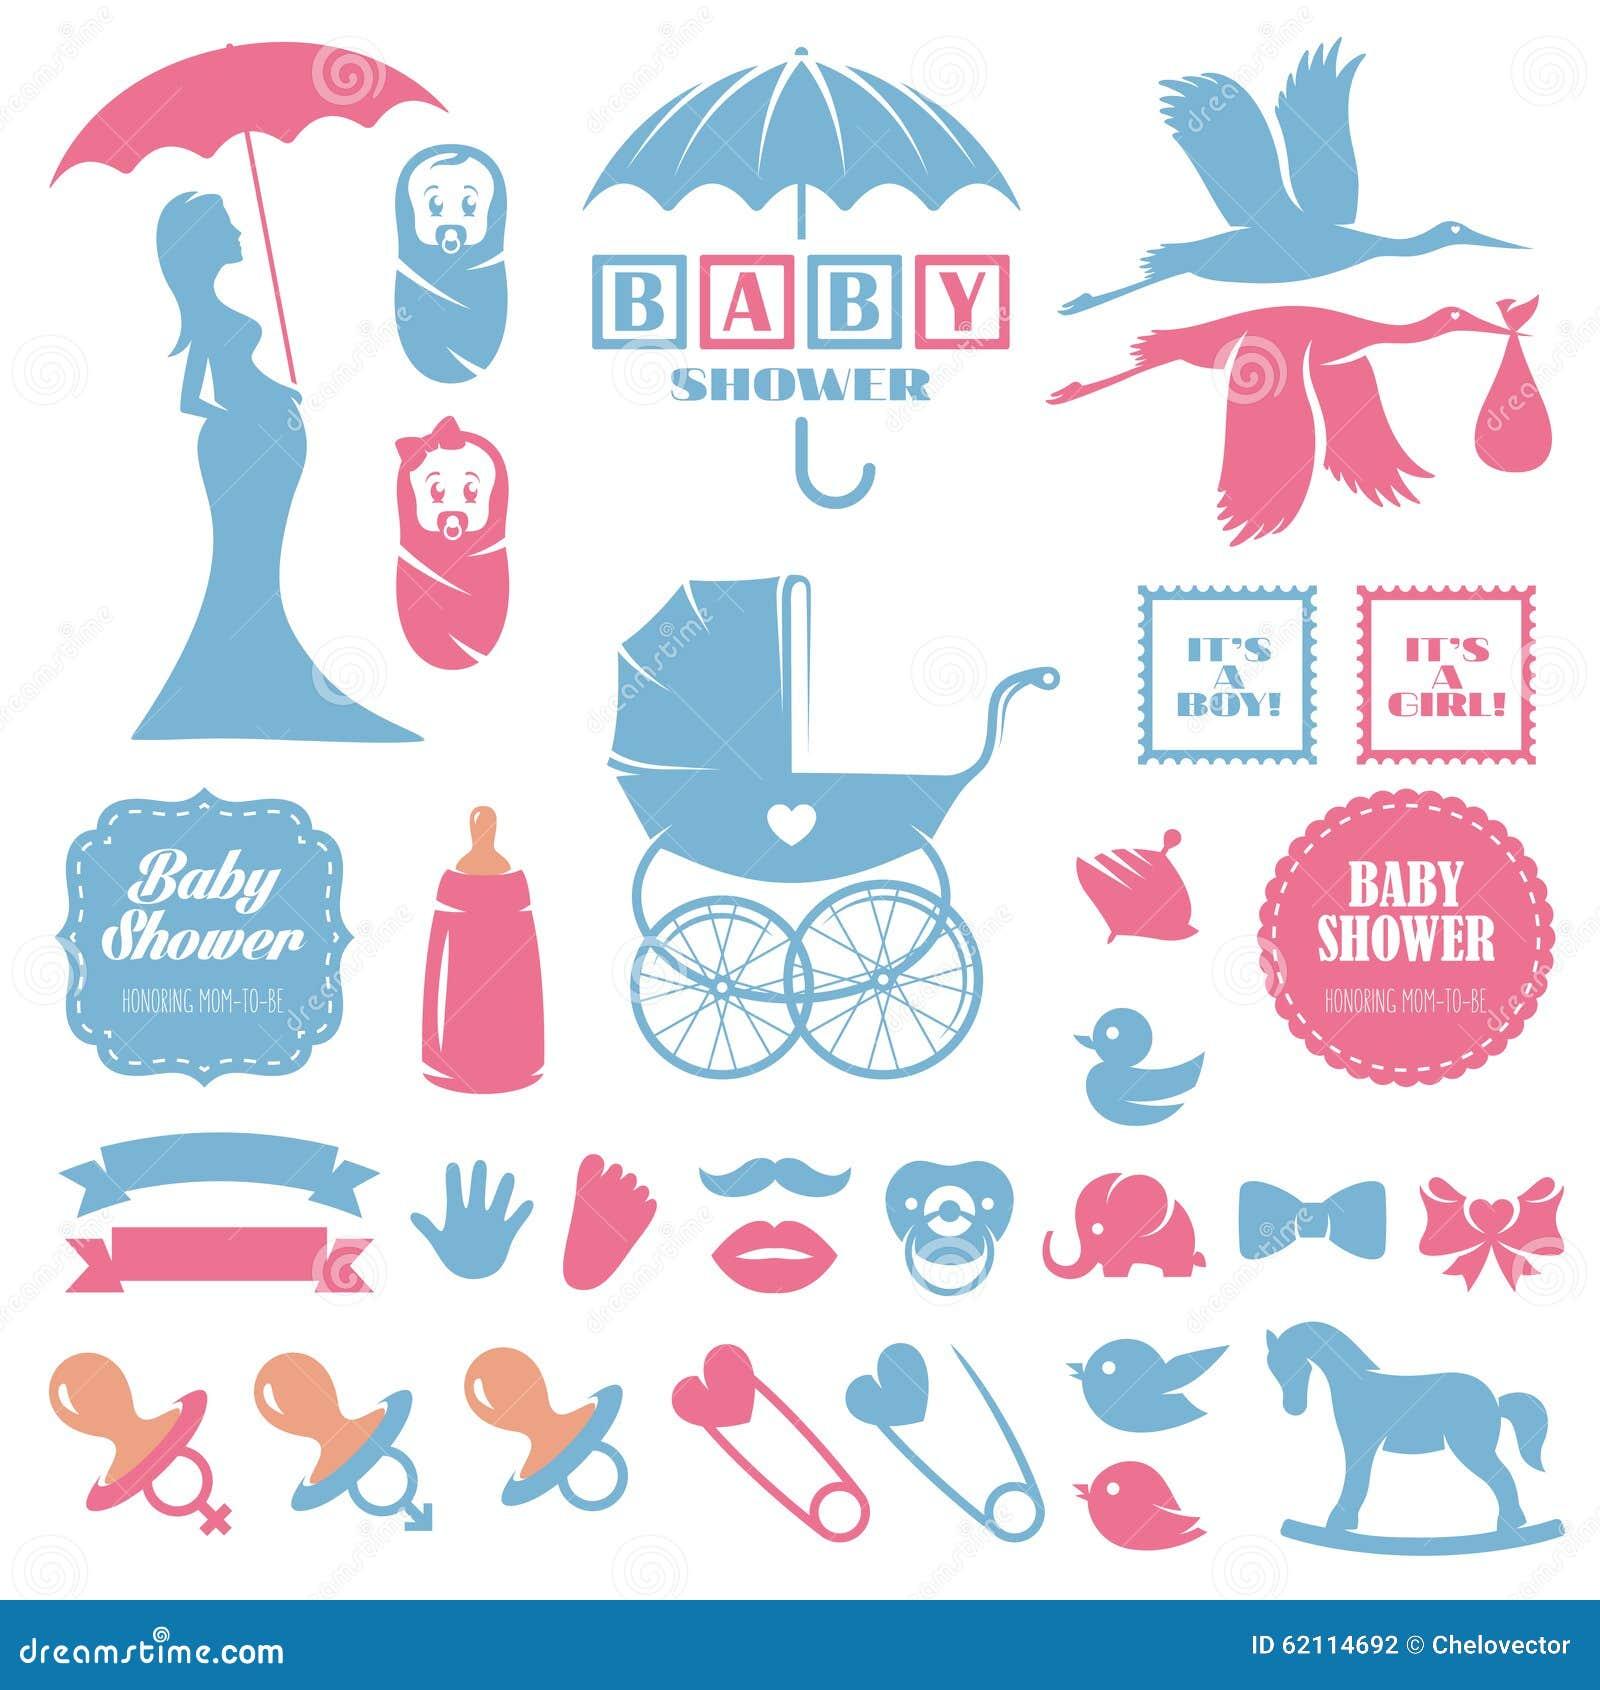 Baby Shower Design Elements Vector Set. Pregnancy Stock